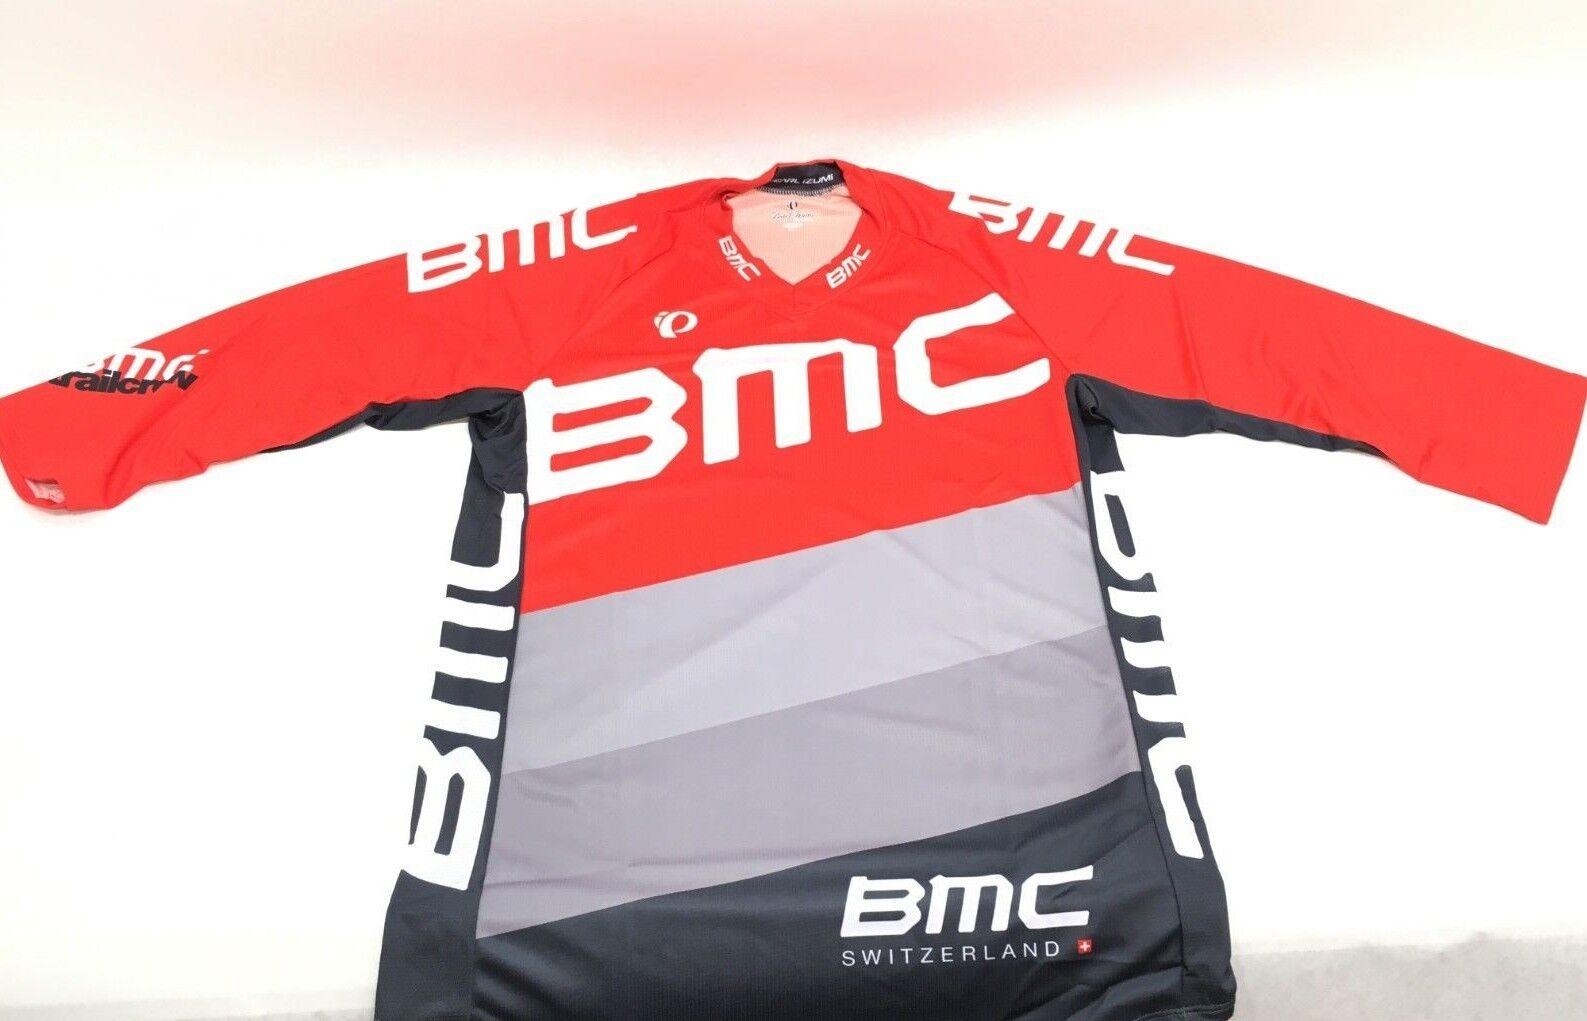 Pearl Izumi BMC  Trailcrew Mountain Bike Jersey Baggy Red Women's - XS - 215432  world famous sale online